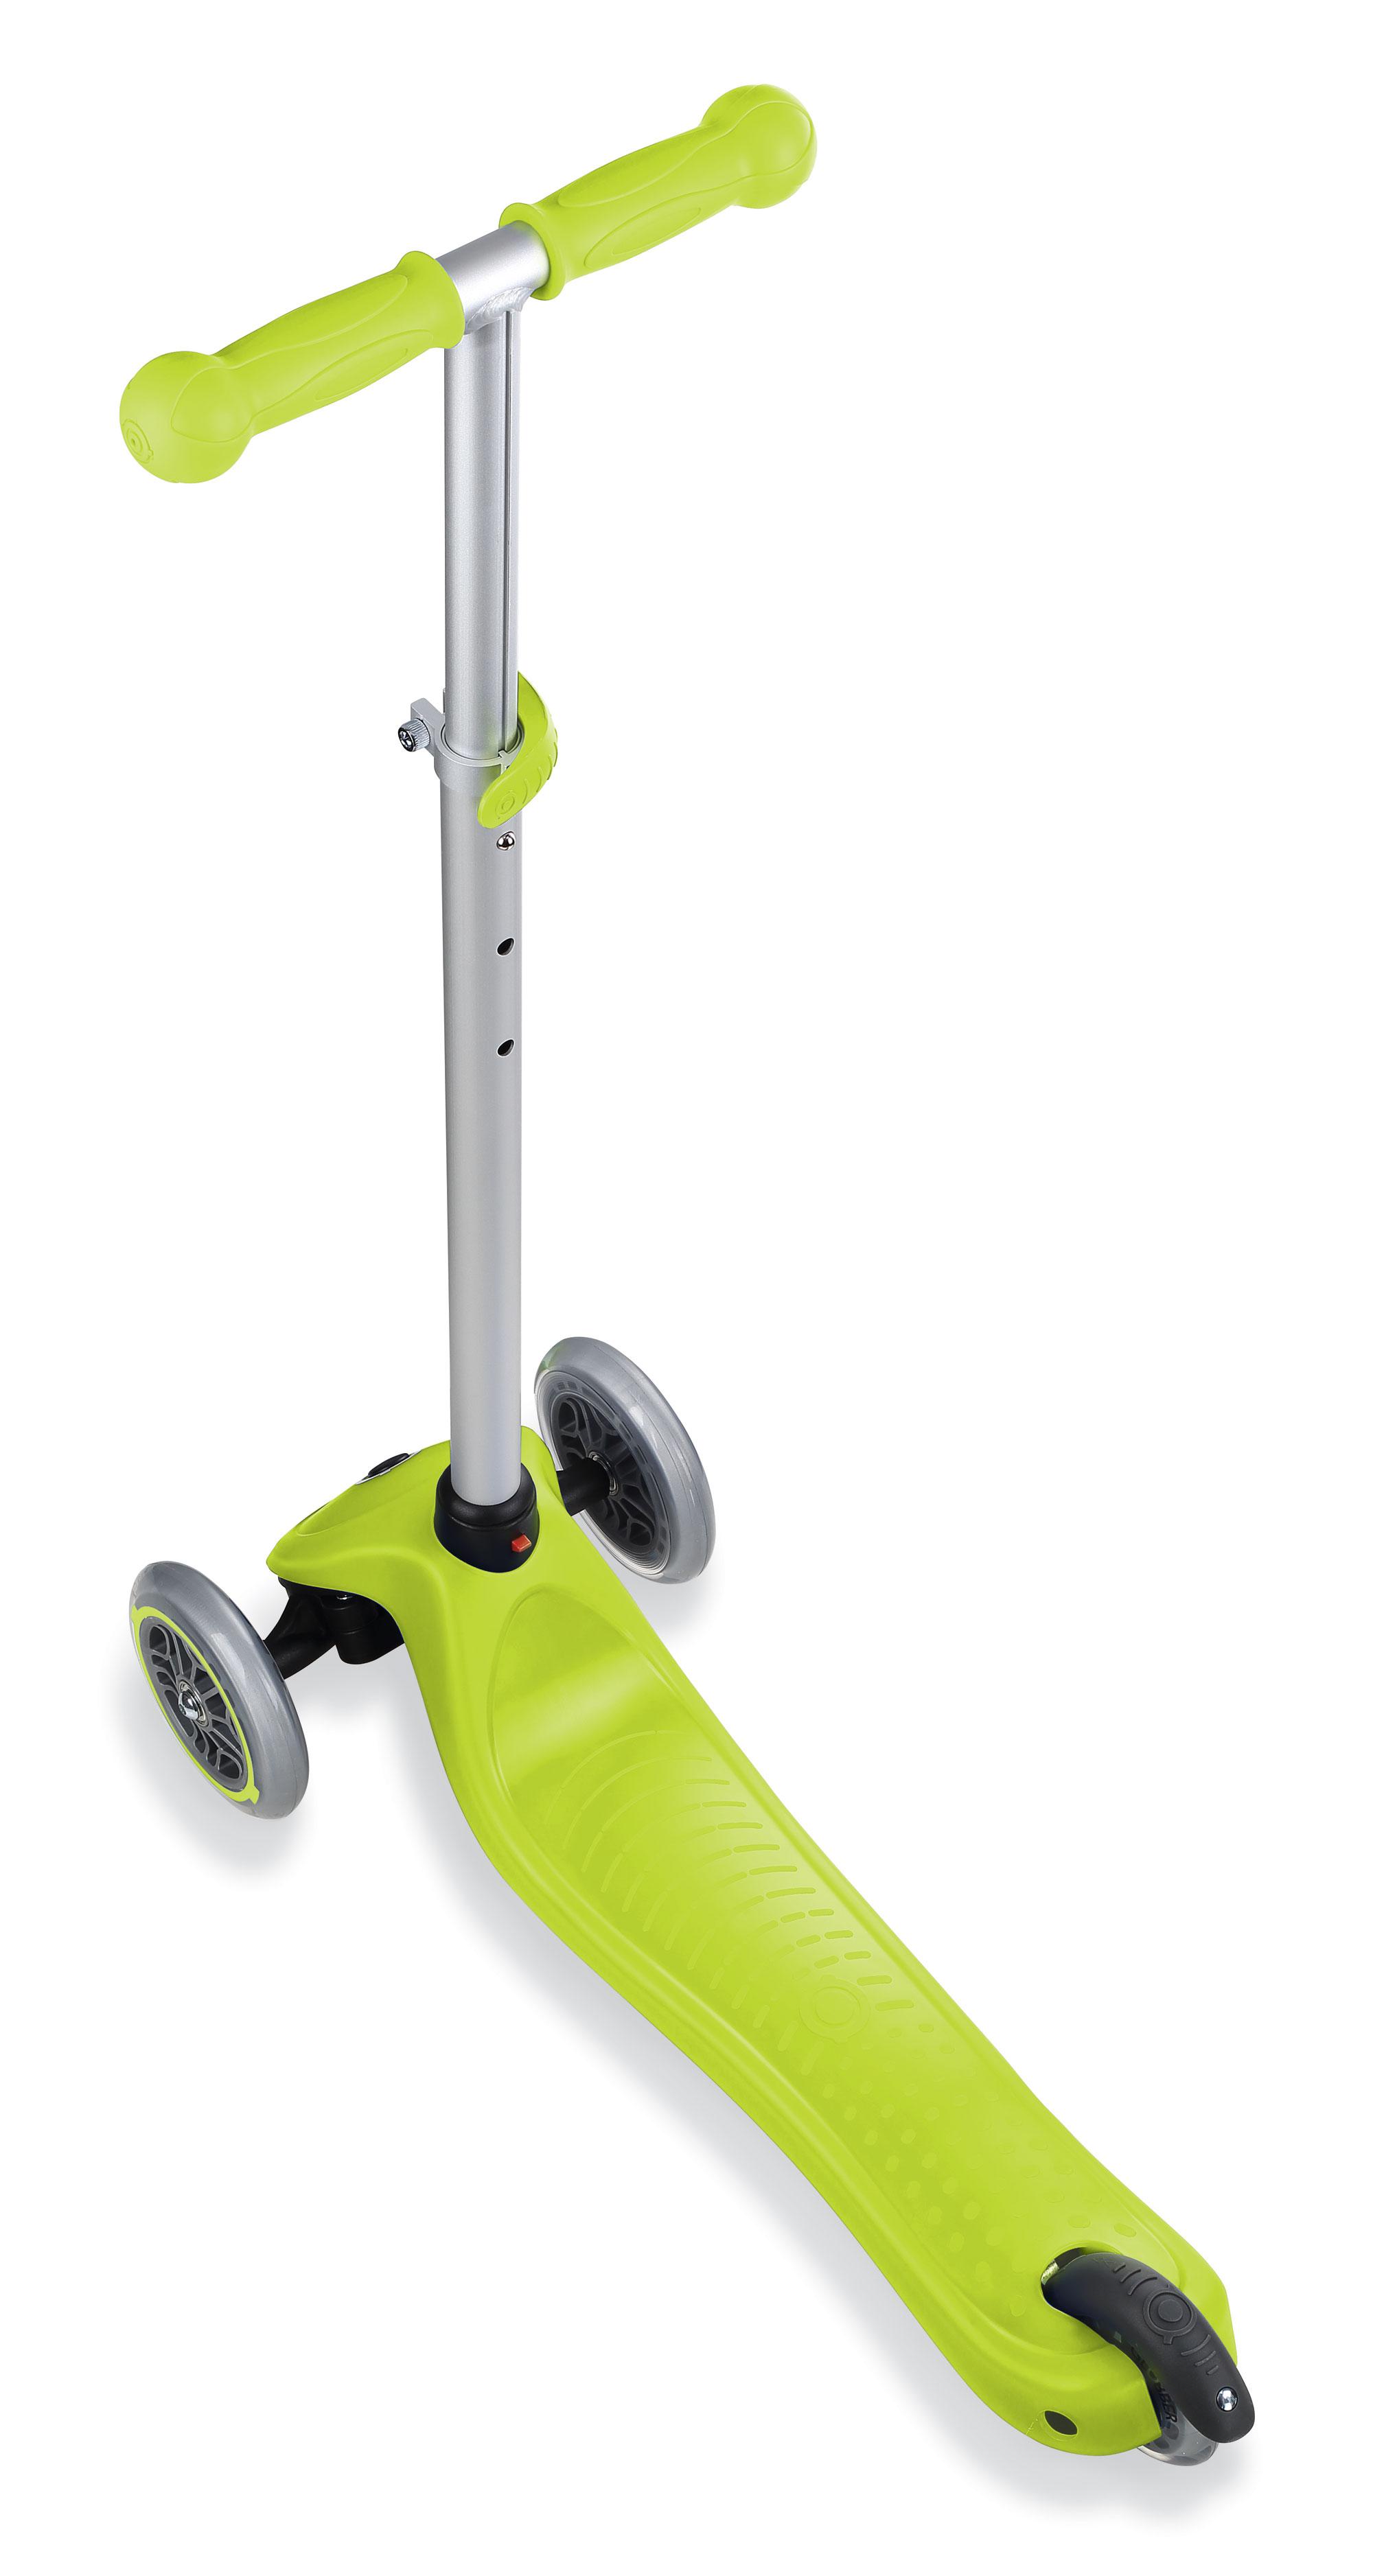 Scooter / Kinderroller / Dreirad / Laufrad Globber Evo 4in1 grün Set Bild 5